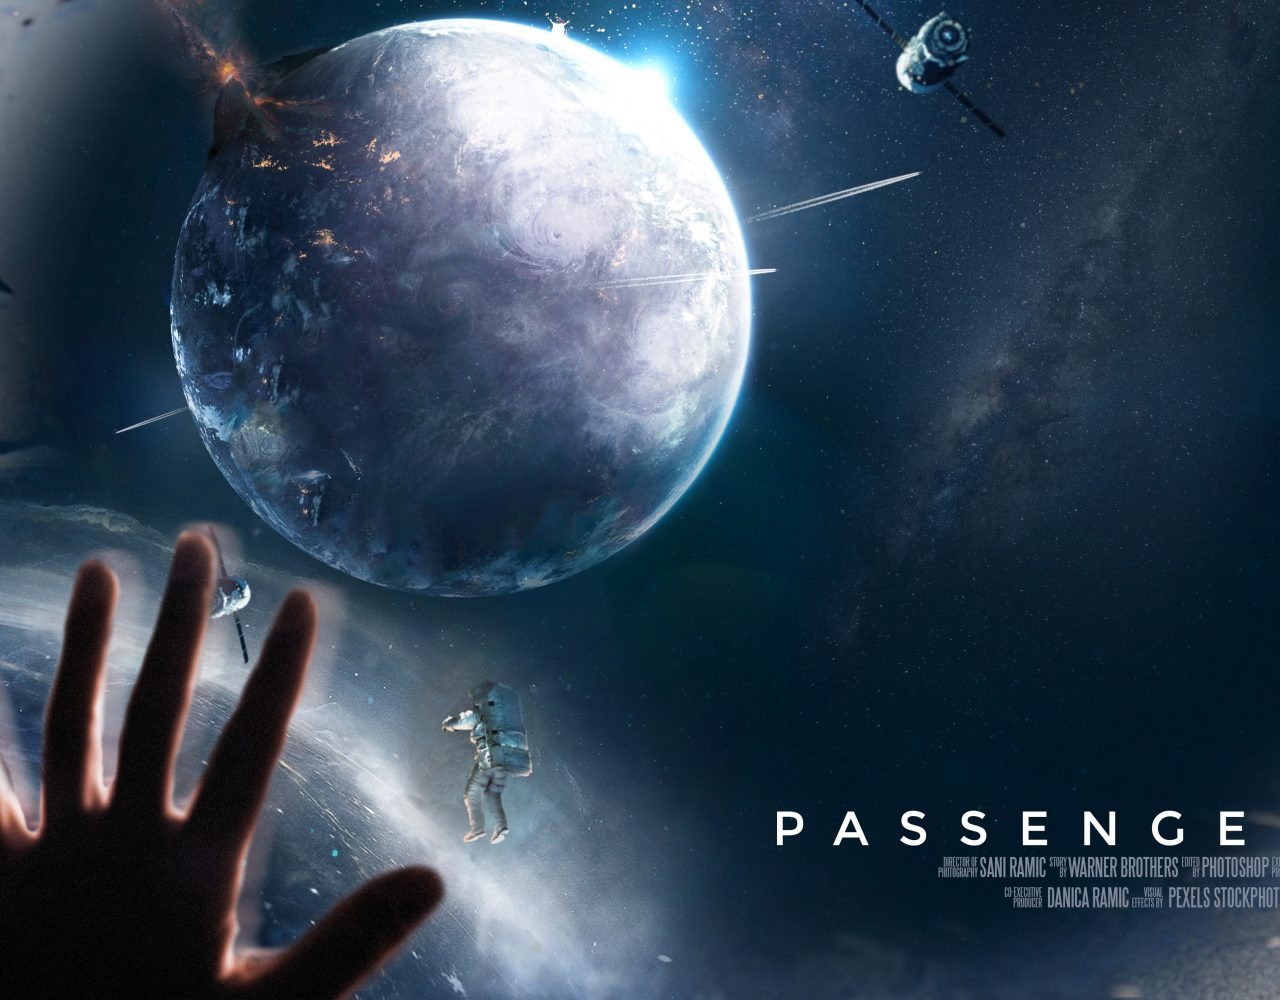 Graphic Design Photo Retouch Manipulation PASSENGERS Film Movie